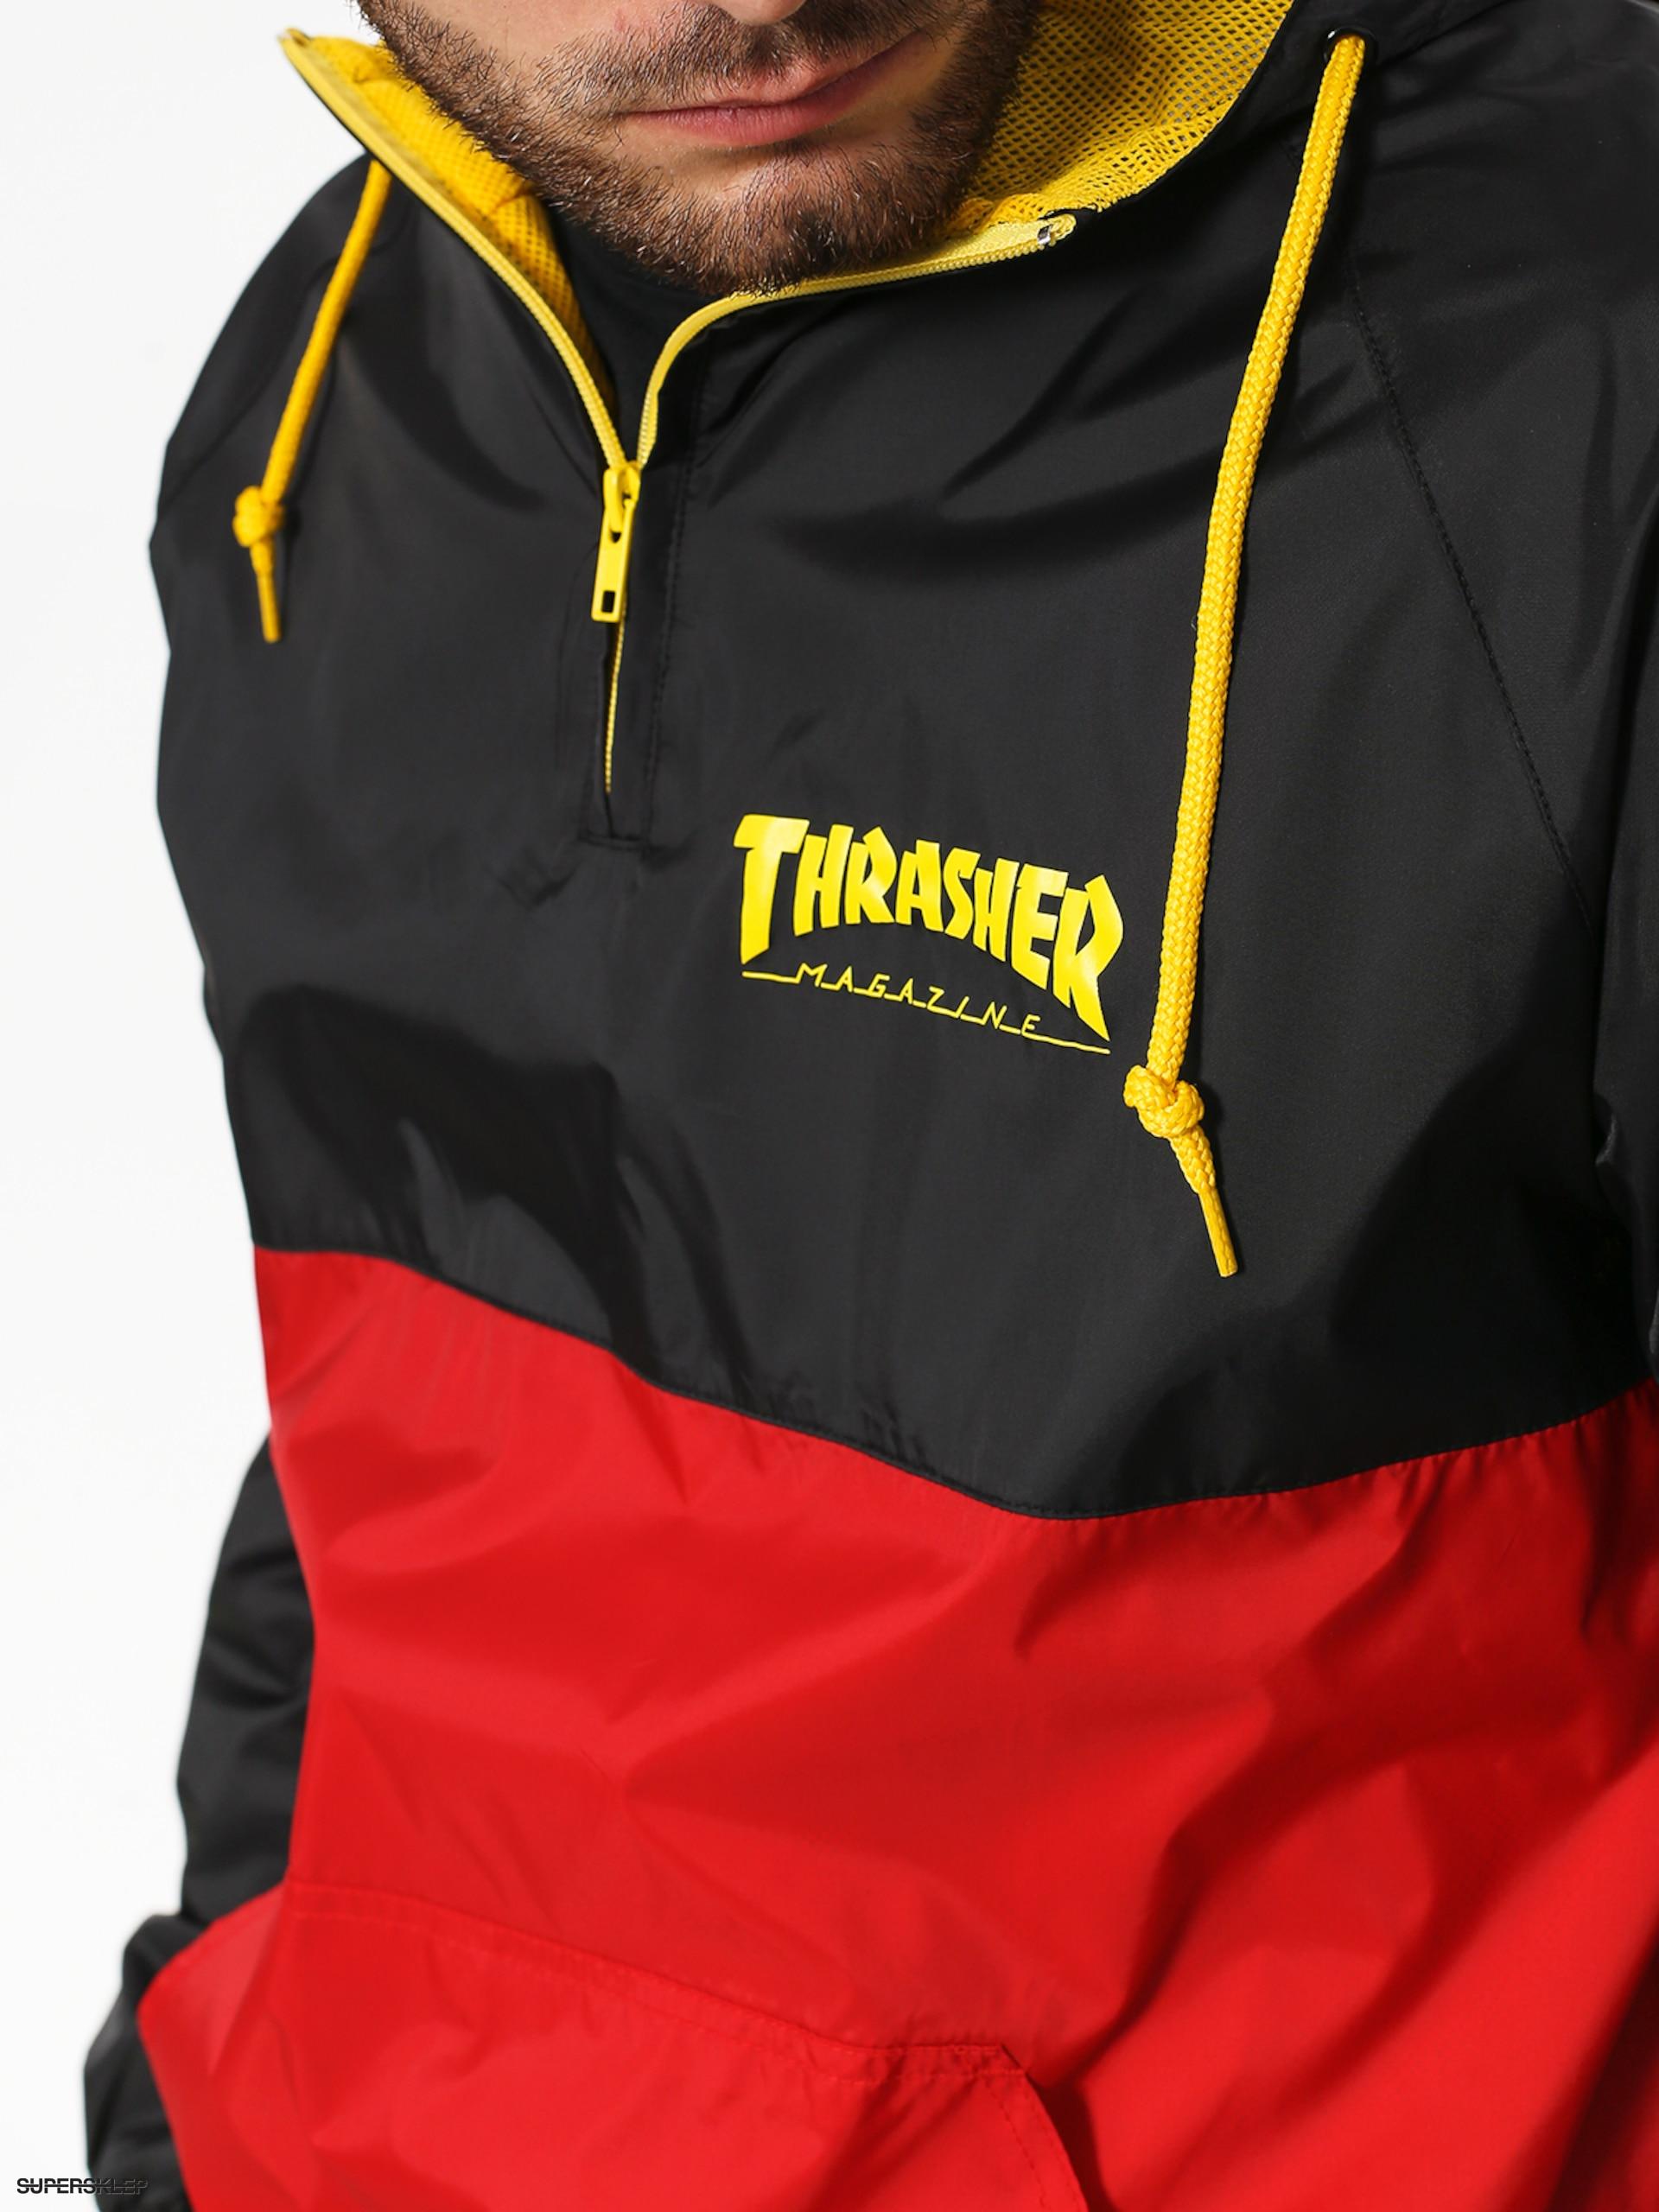 Thrasher Mag Logo Anorak Blackredyellow Official Photos 07c4e Cb58e Jaket Hodie Sk 17 Jacket Blackred Premium Selection B05cc E48b1 Bunda Black Red Wholesale Dealer 8d613 5f2d4